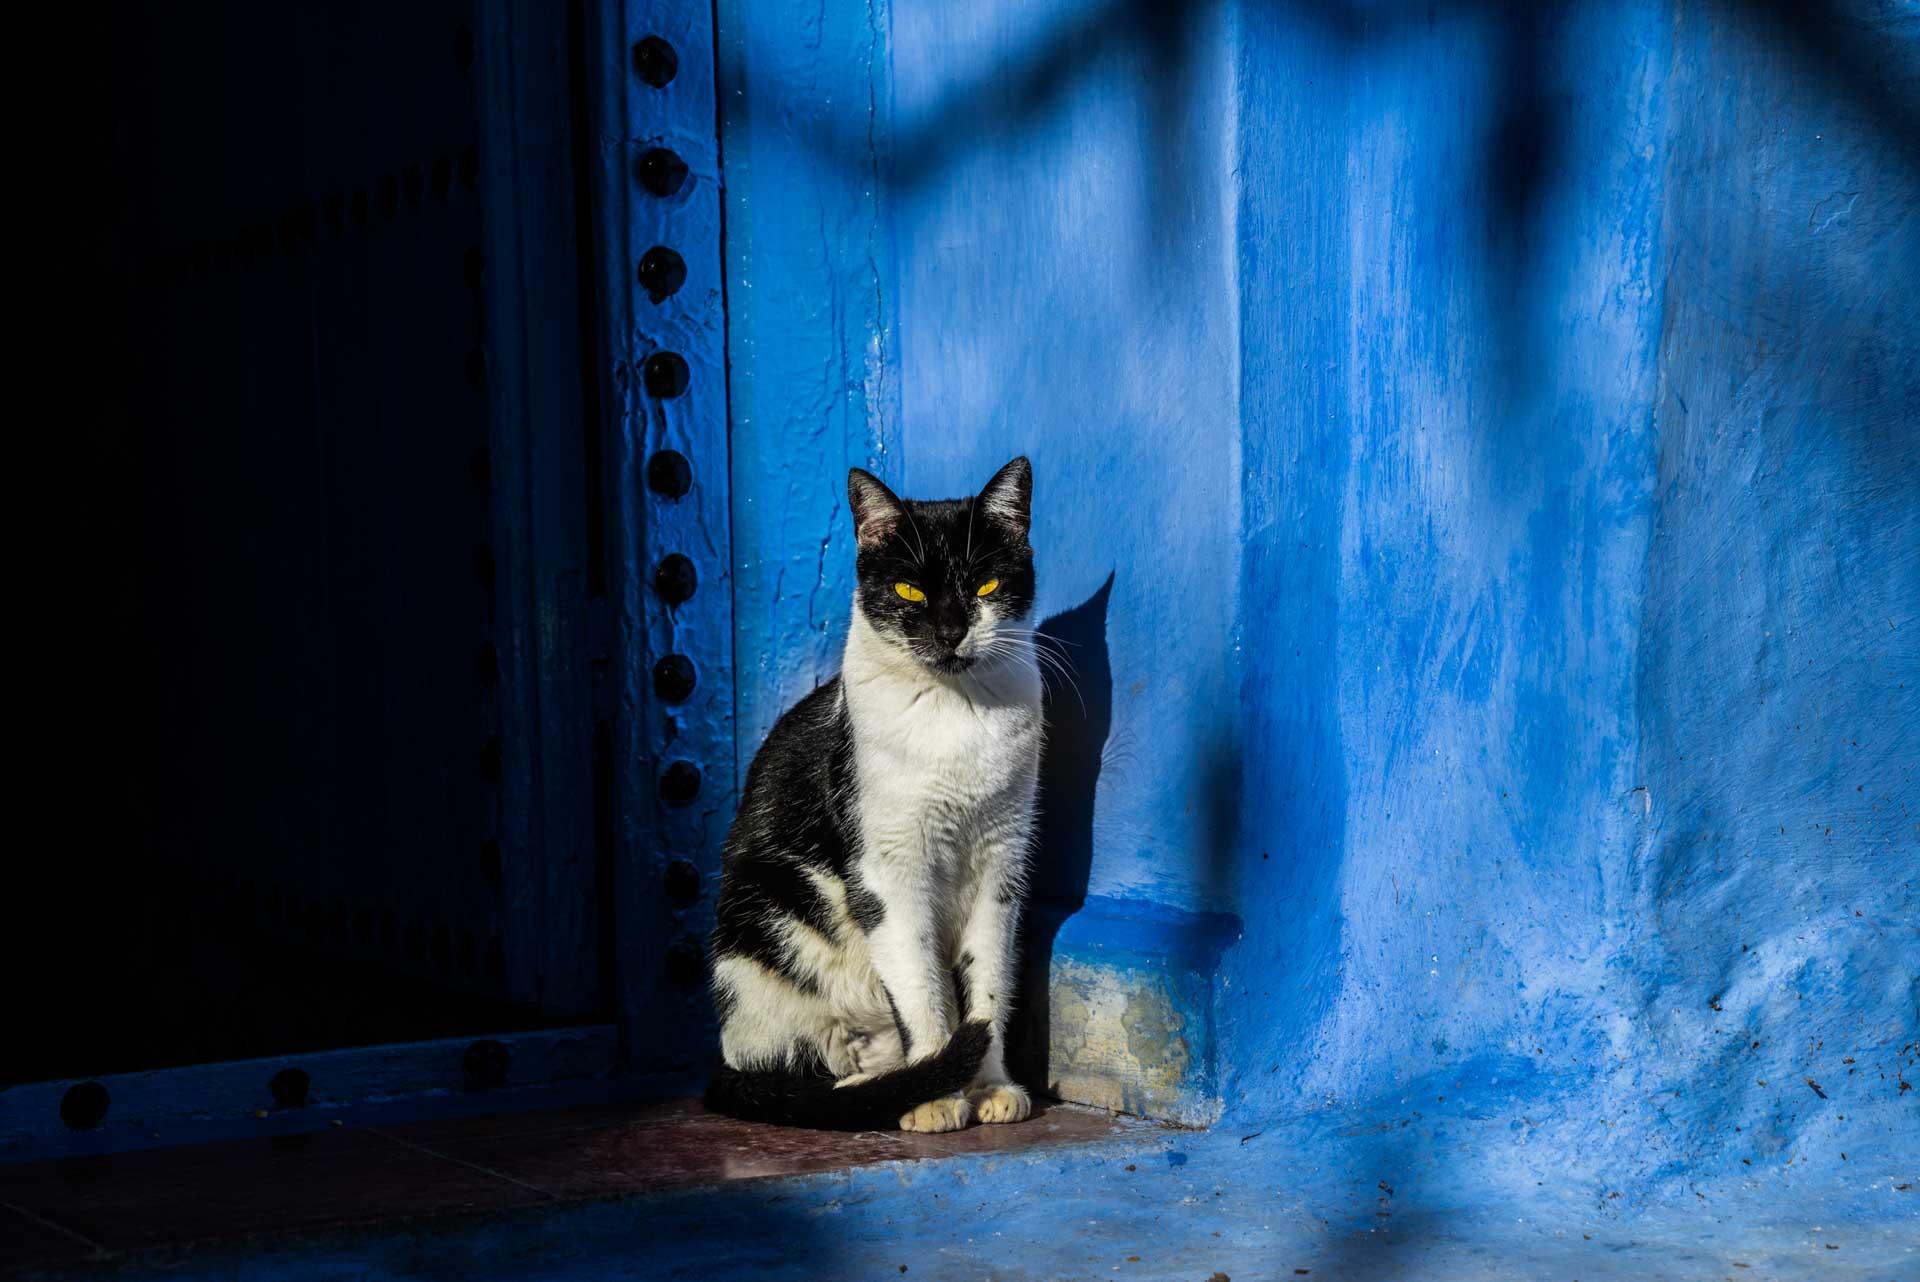 Morocco Chefchaouen blue cat, morocco, chefchaouen, , pescart, photo blog, travel blog, blog, photo travel blog, enrico pescantini, pescantini